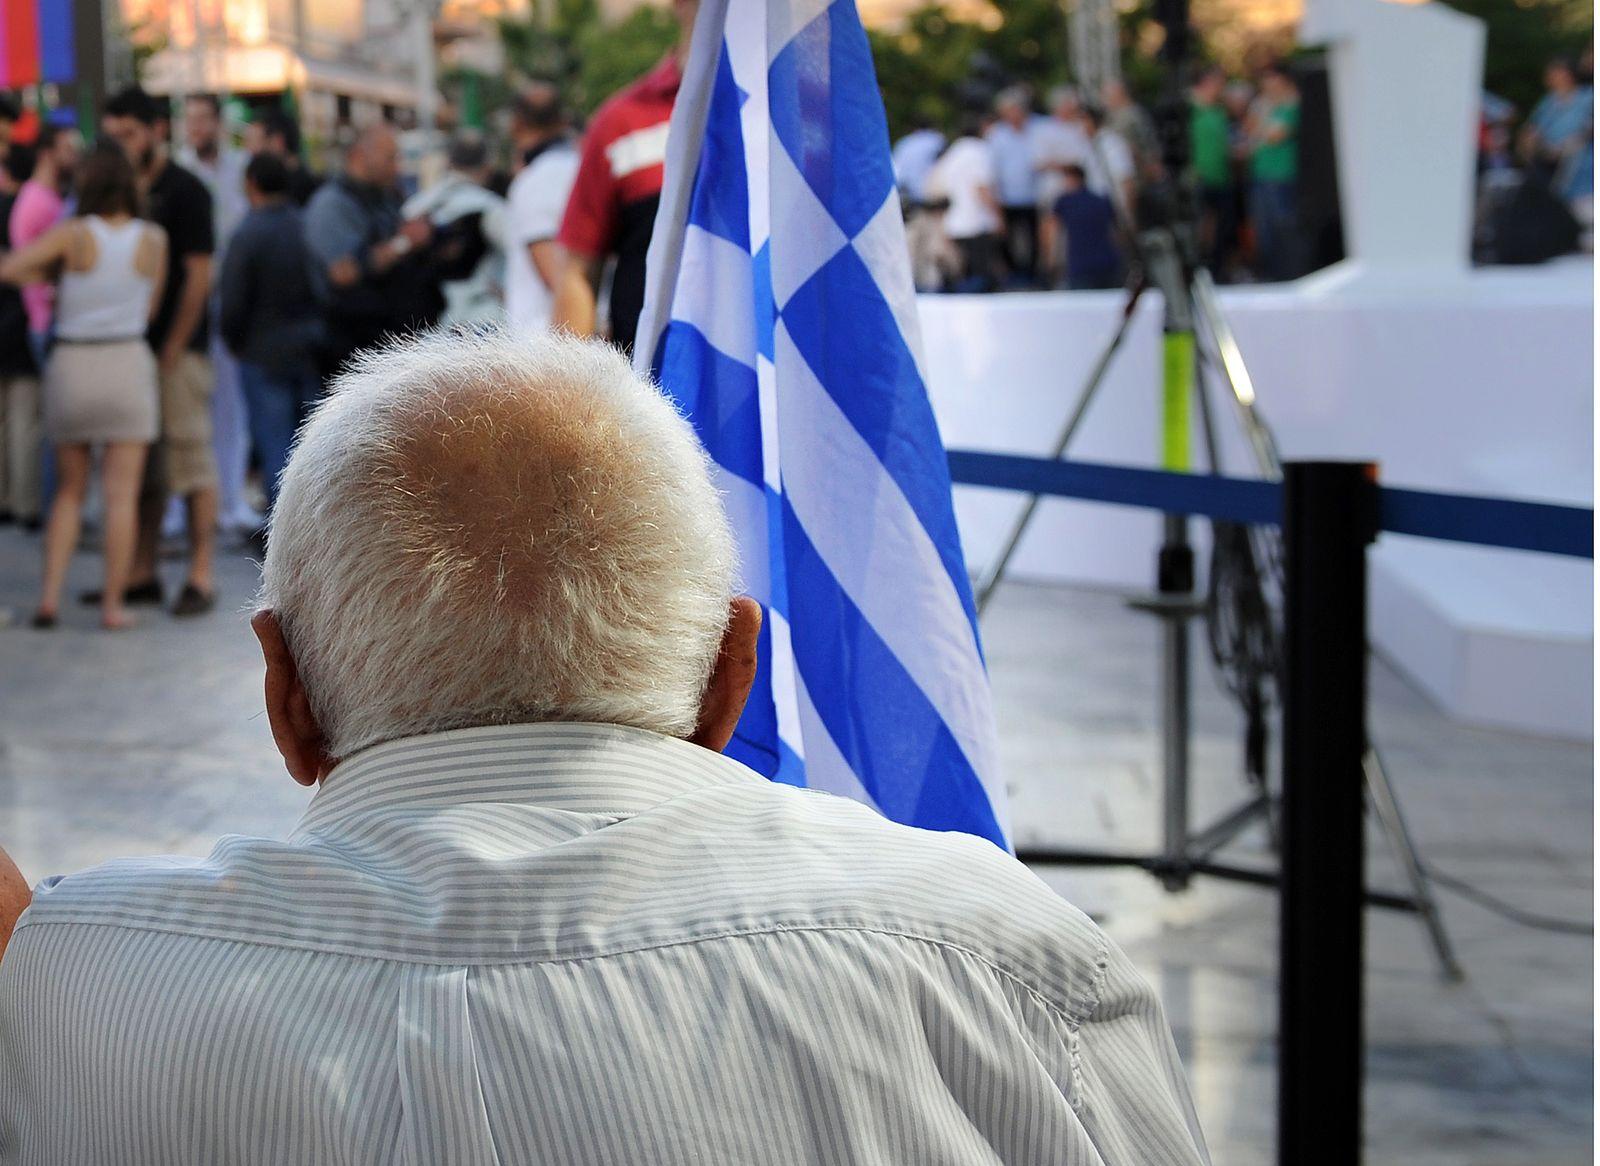 Griechenland / Rentner / Rente